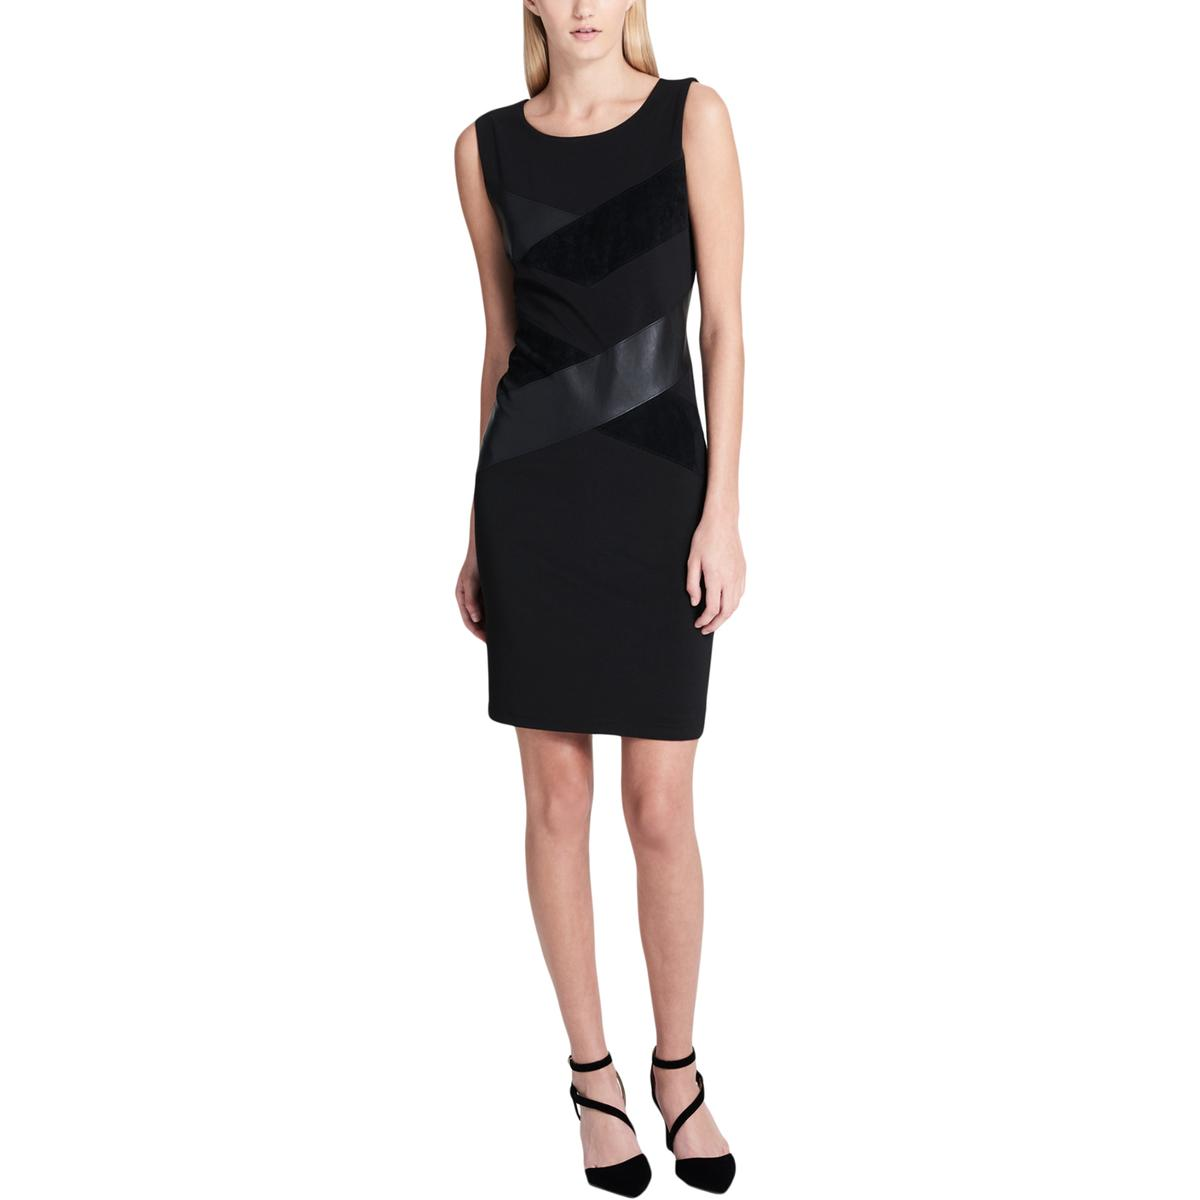 485e88f3331 Details about Calvin Klein Womens Black Faux Leather   Suede Mini Dress 16  BHFO 7425